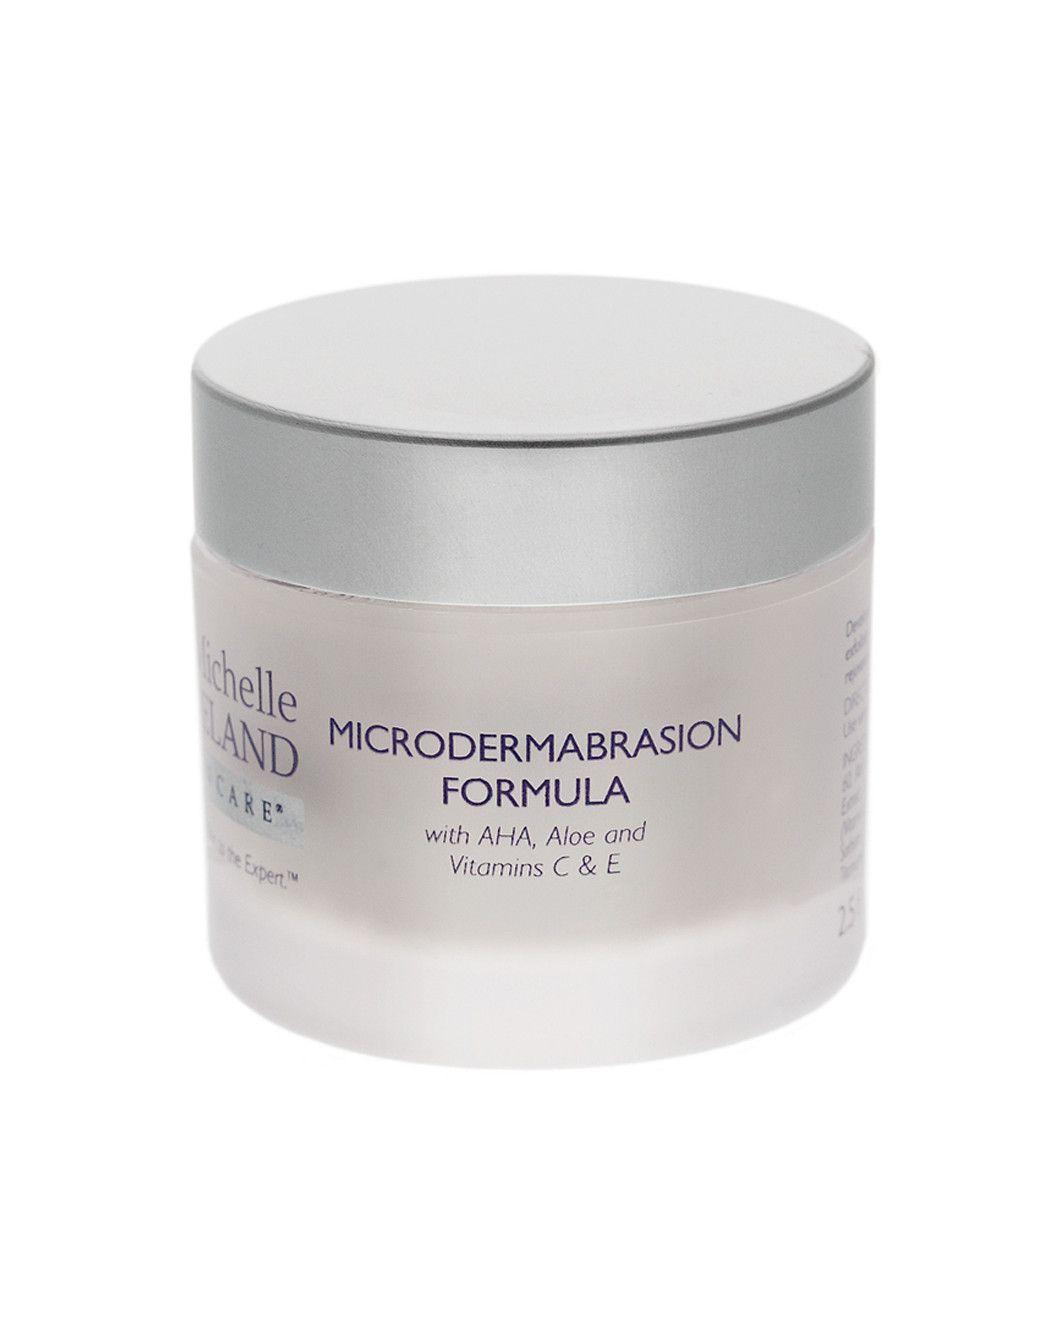 Rue La La Boutiques Microdermabrasion Microdermabrasion Benefits Skin Care